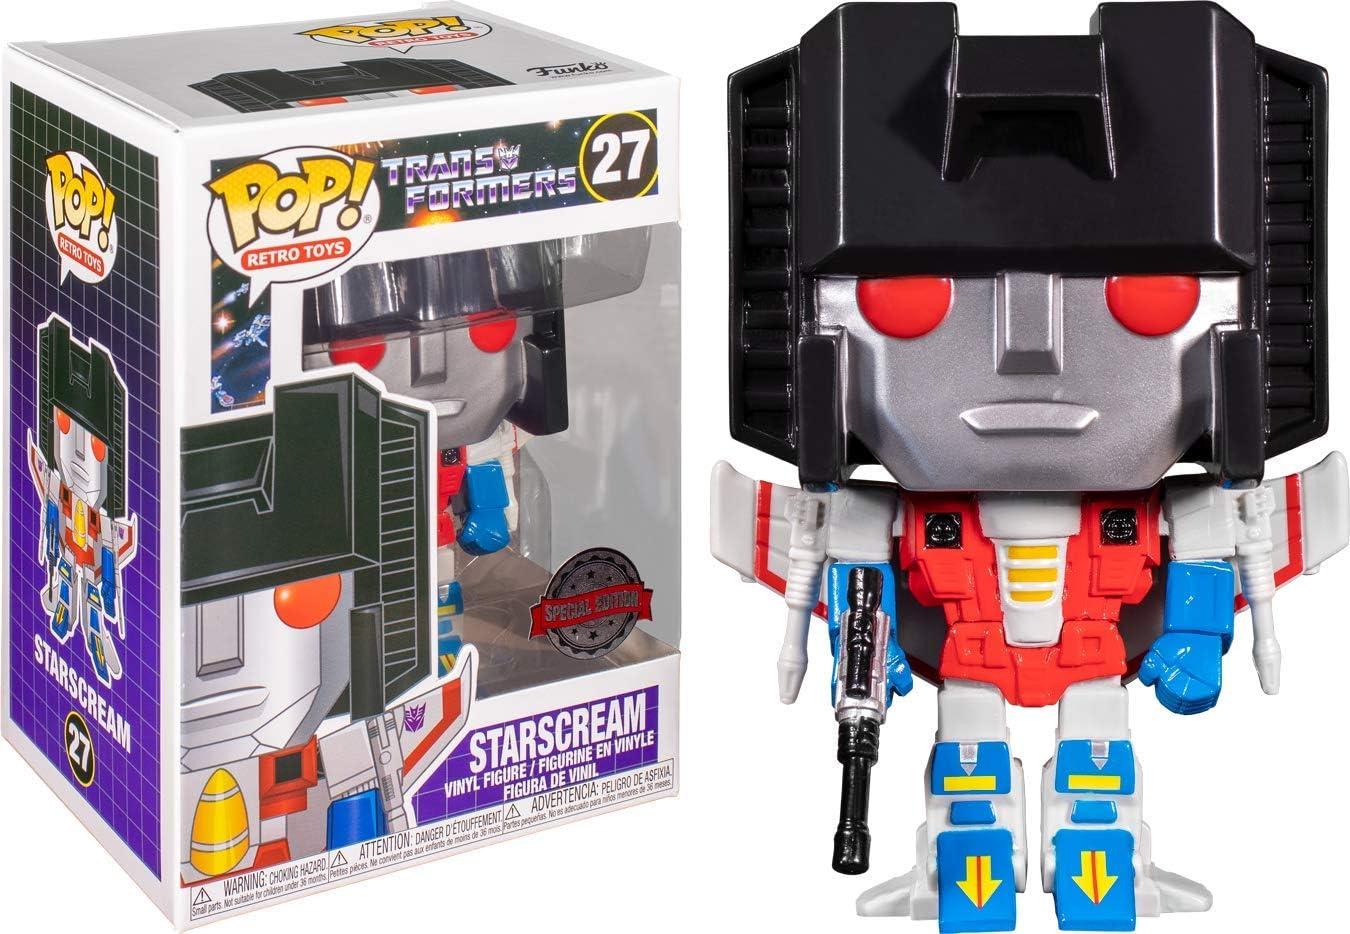 Funko POP Retro Toys: Transformers Target - 1 year At the price warranty Exclusi Starscream